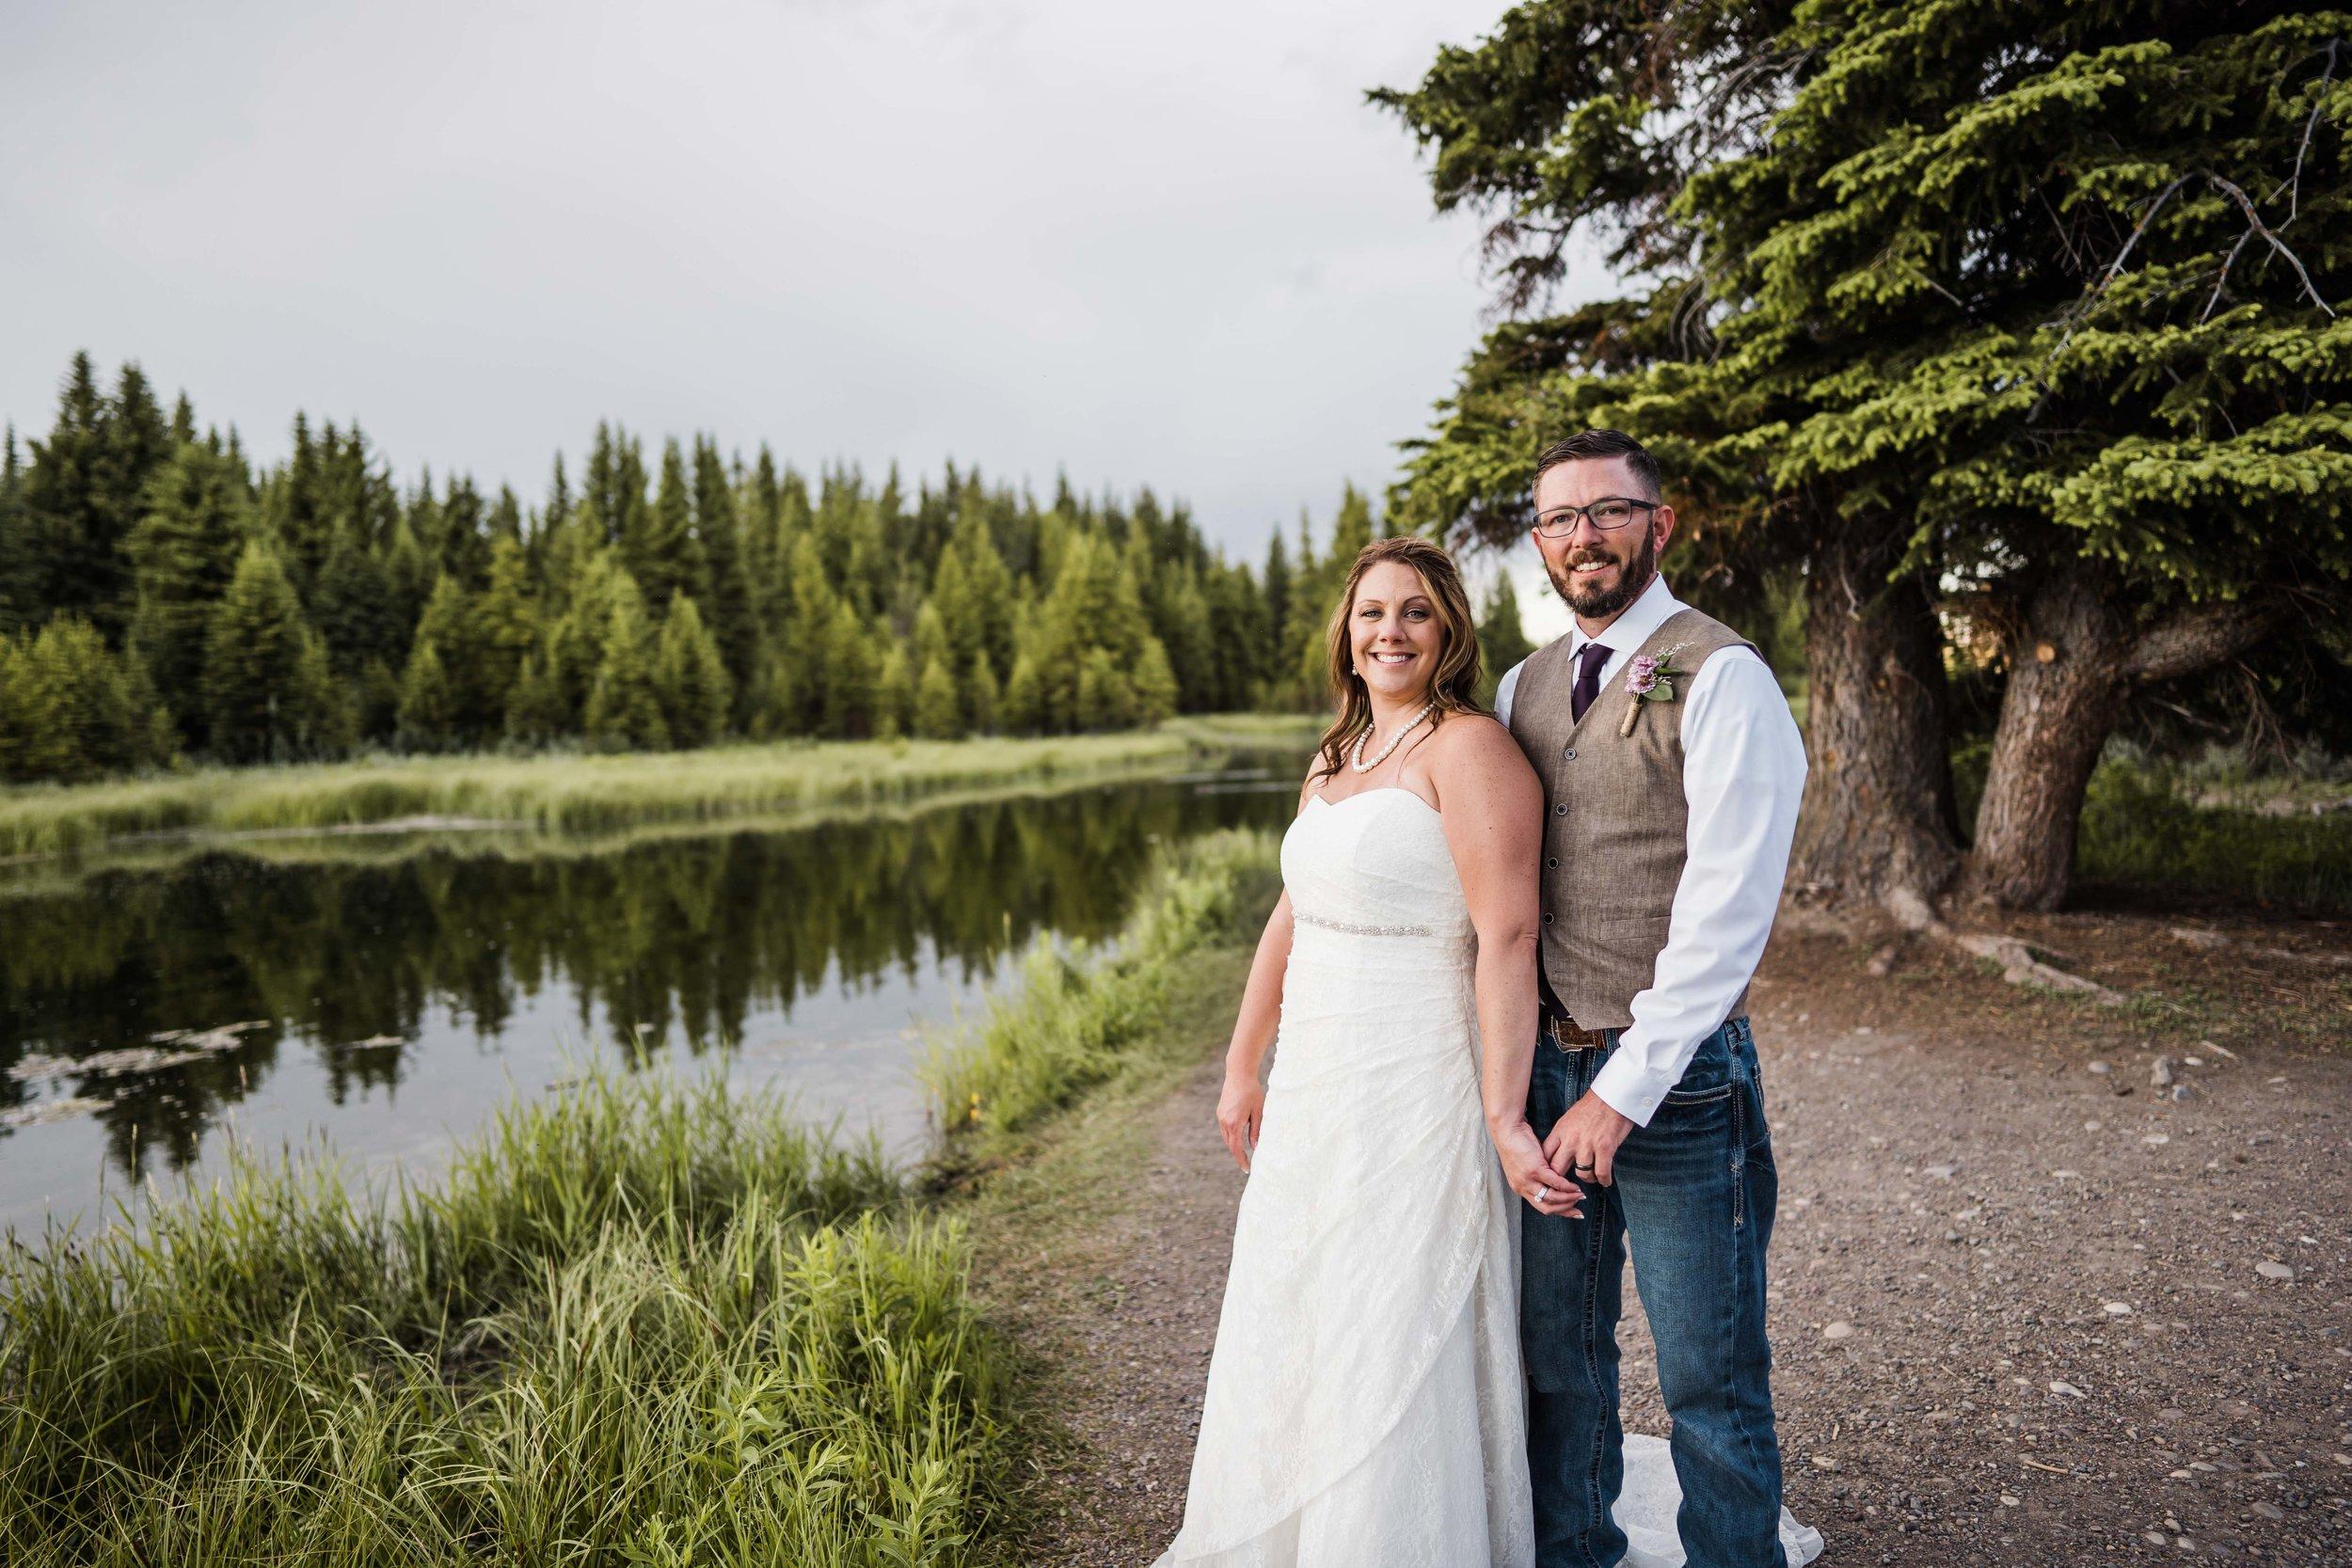 jackson hole adventure wedding photography at schwabachers landing in GTNP -DSD01965.jpg